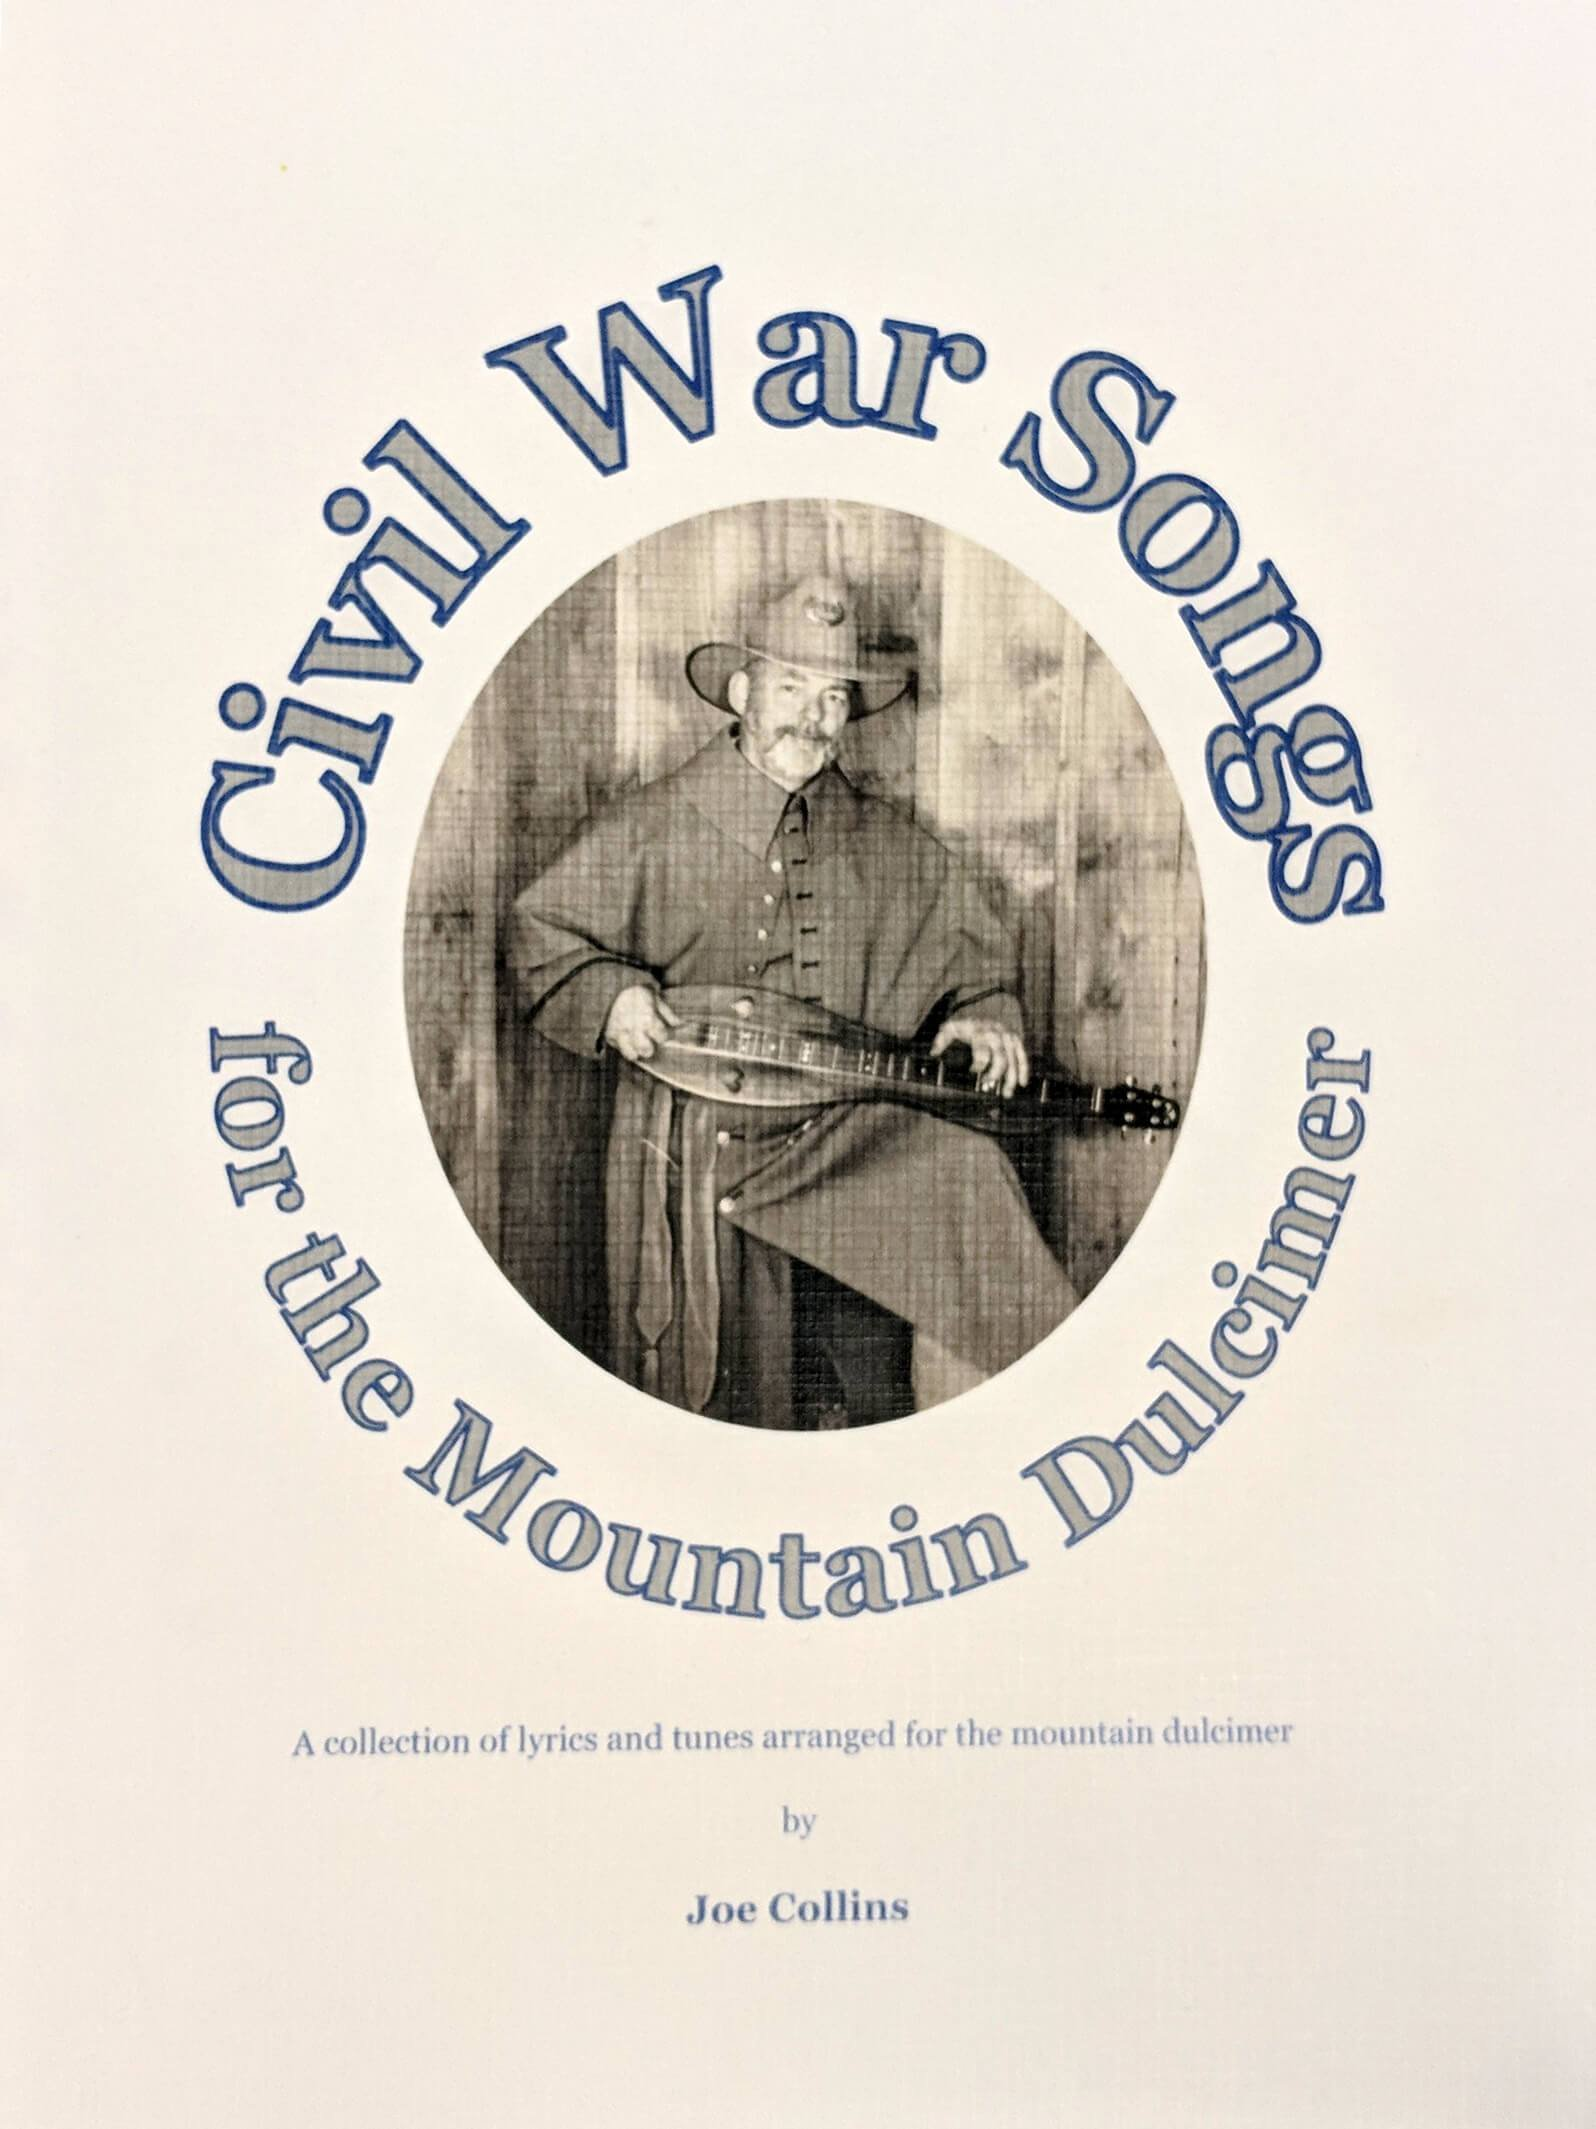 Joe Collins - Civil War Songs For The Mountain Dulcimer